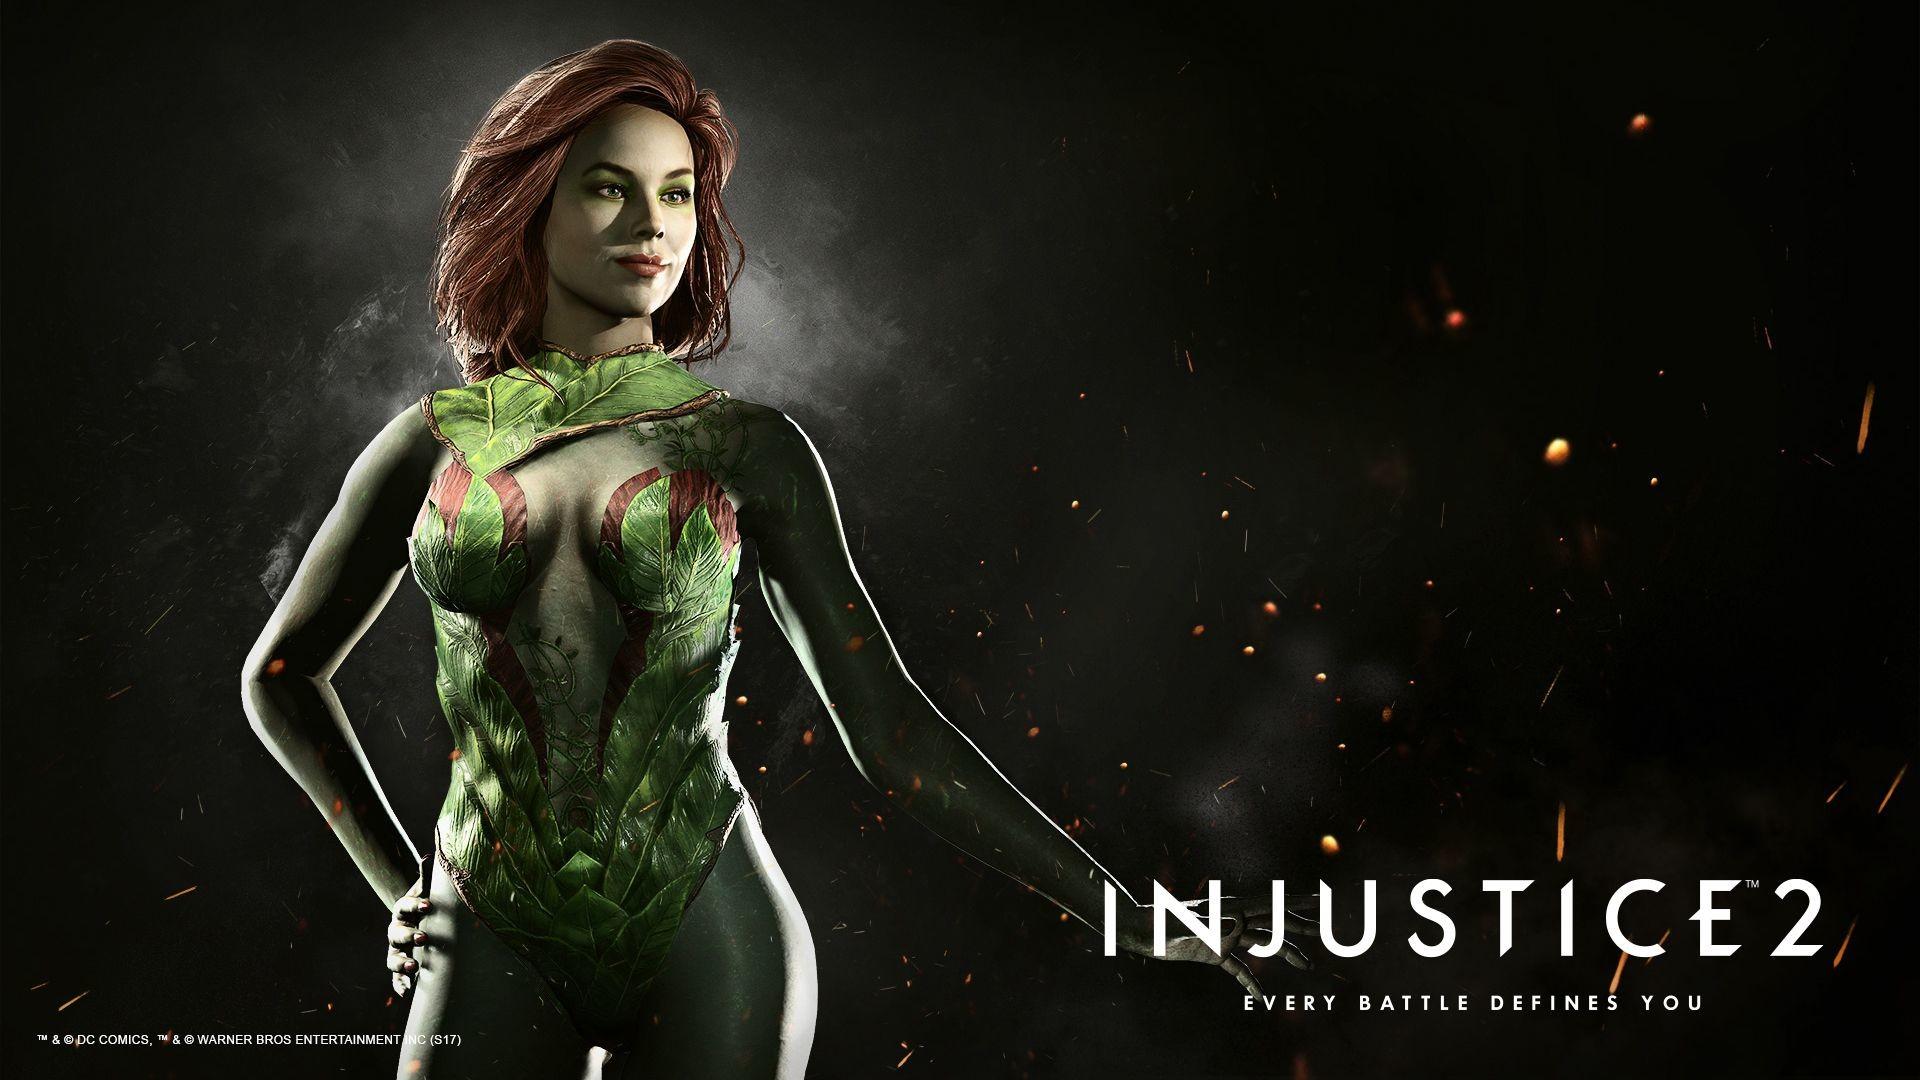 Res: 1920x1080, Poison Ivy Injustice 2 Wallpaper 0001.jpg